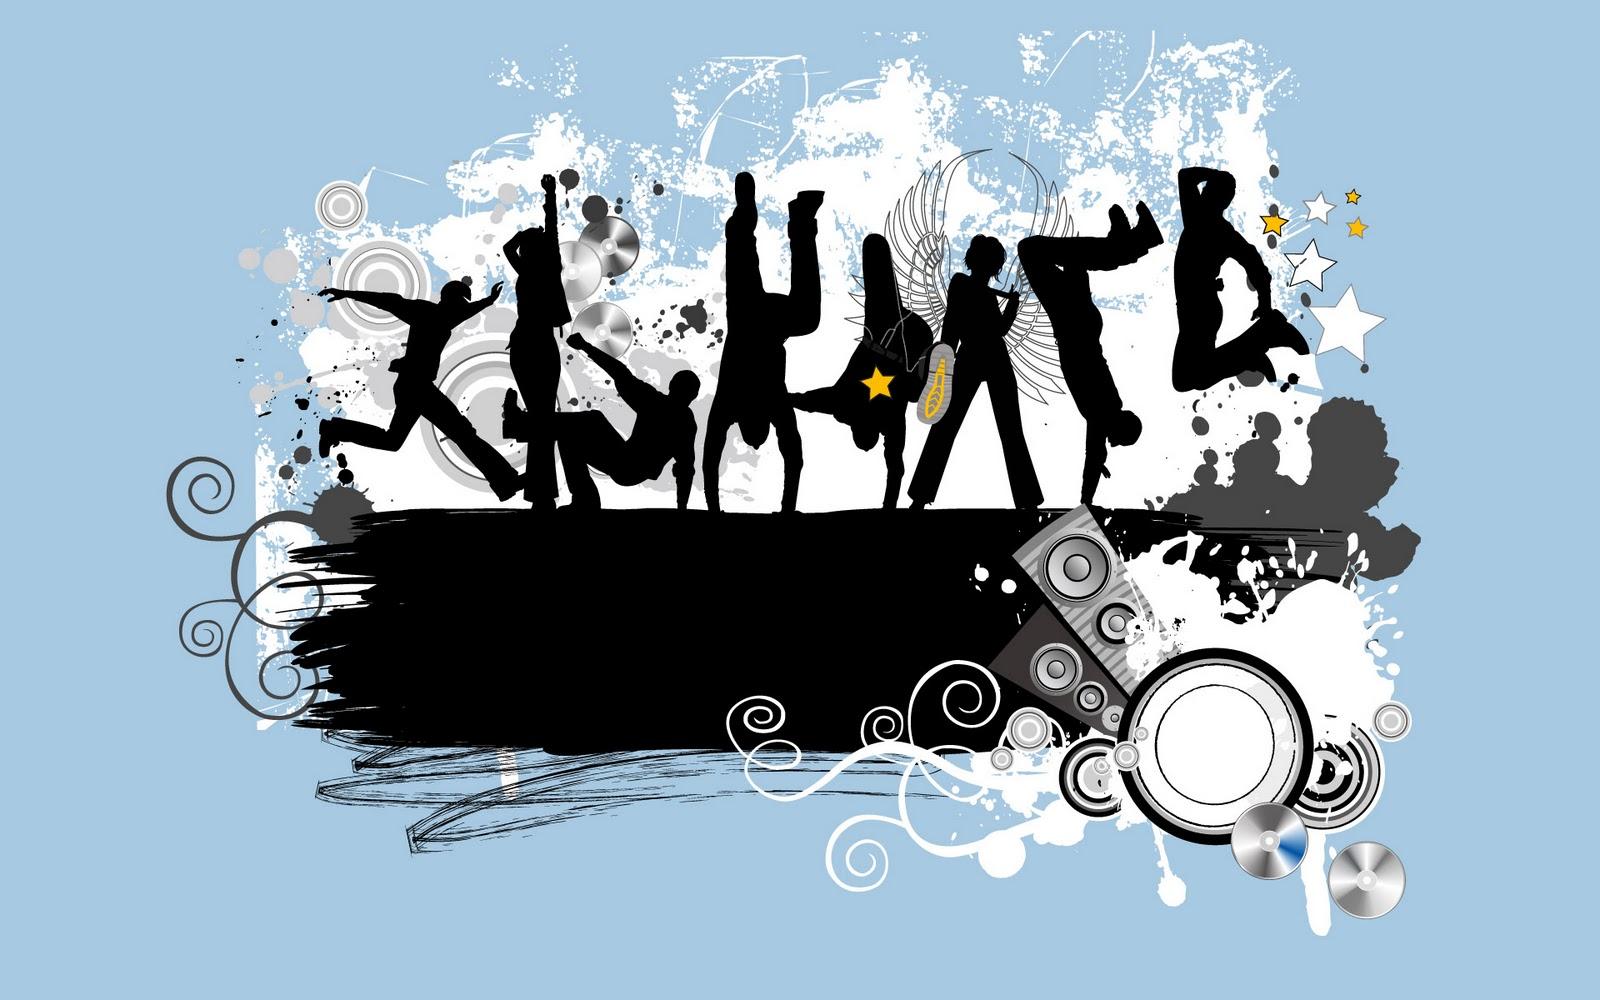 Must see Wallpaper Music Emoji - Music+Wallpaper+%252827%2529  Perfect Image Reference_121024.jpg